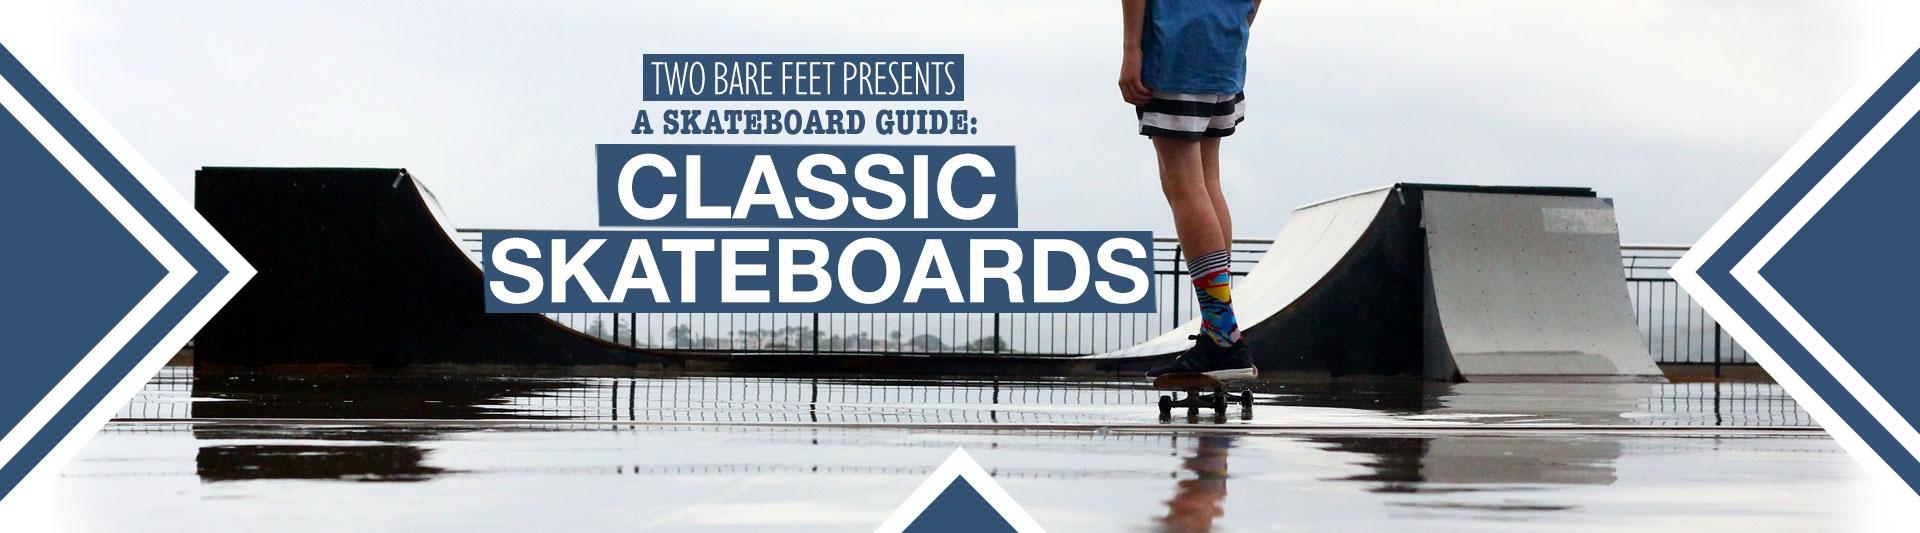 Classic skateboard banner